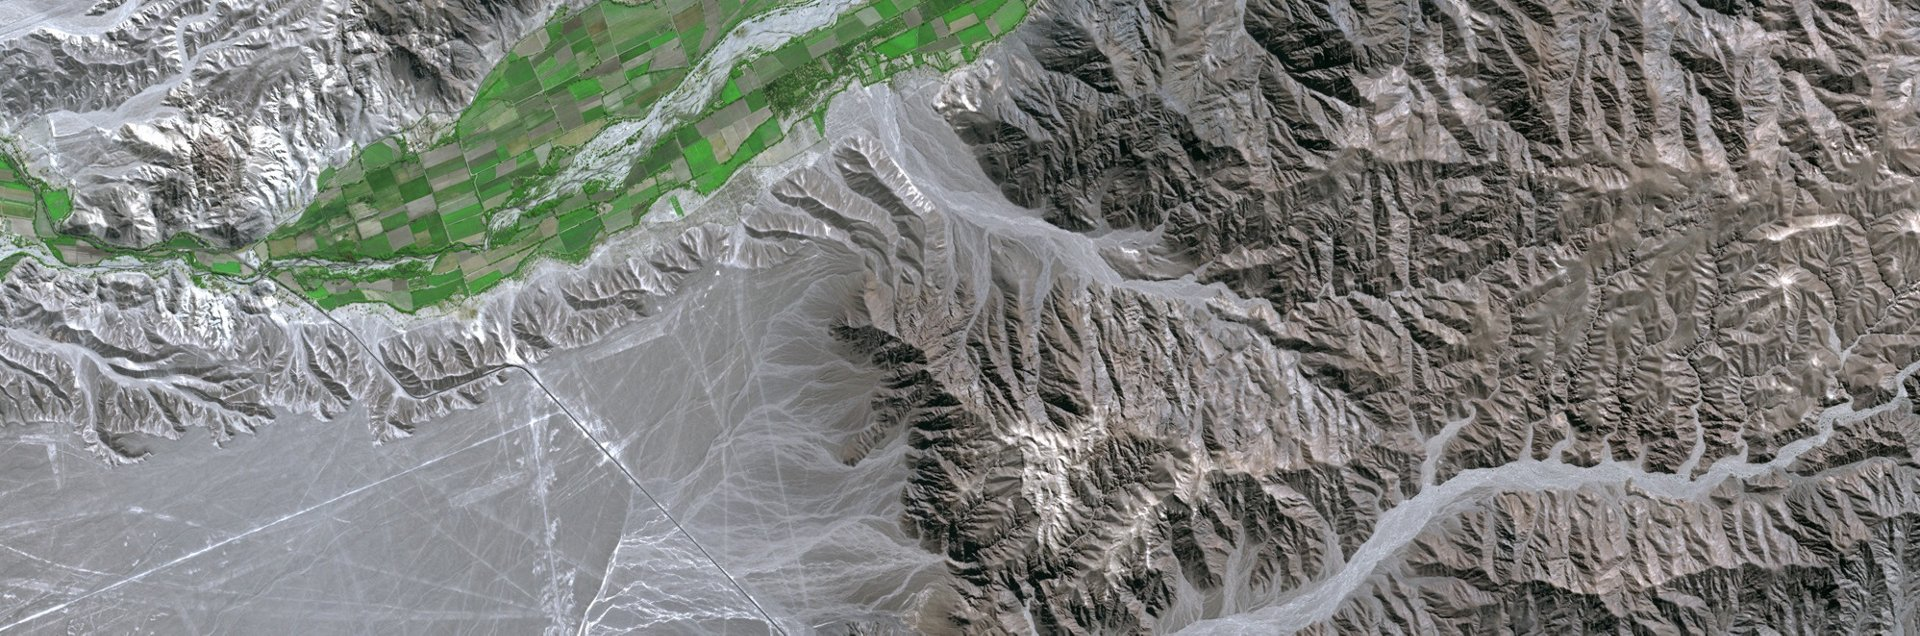 Spot 5 Satellite Imagery - Nazca Lines, Peru